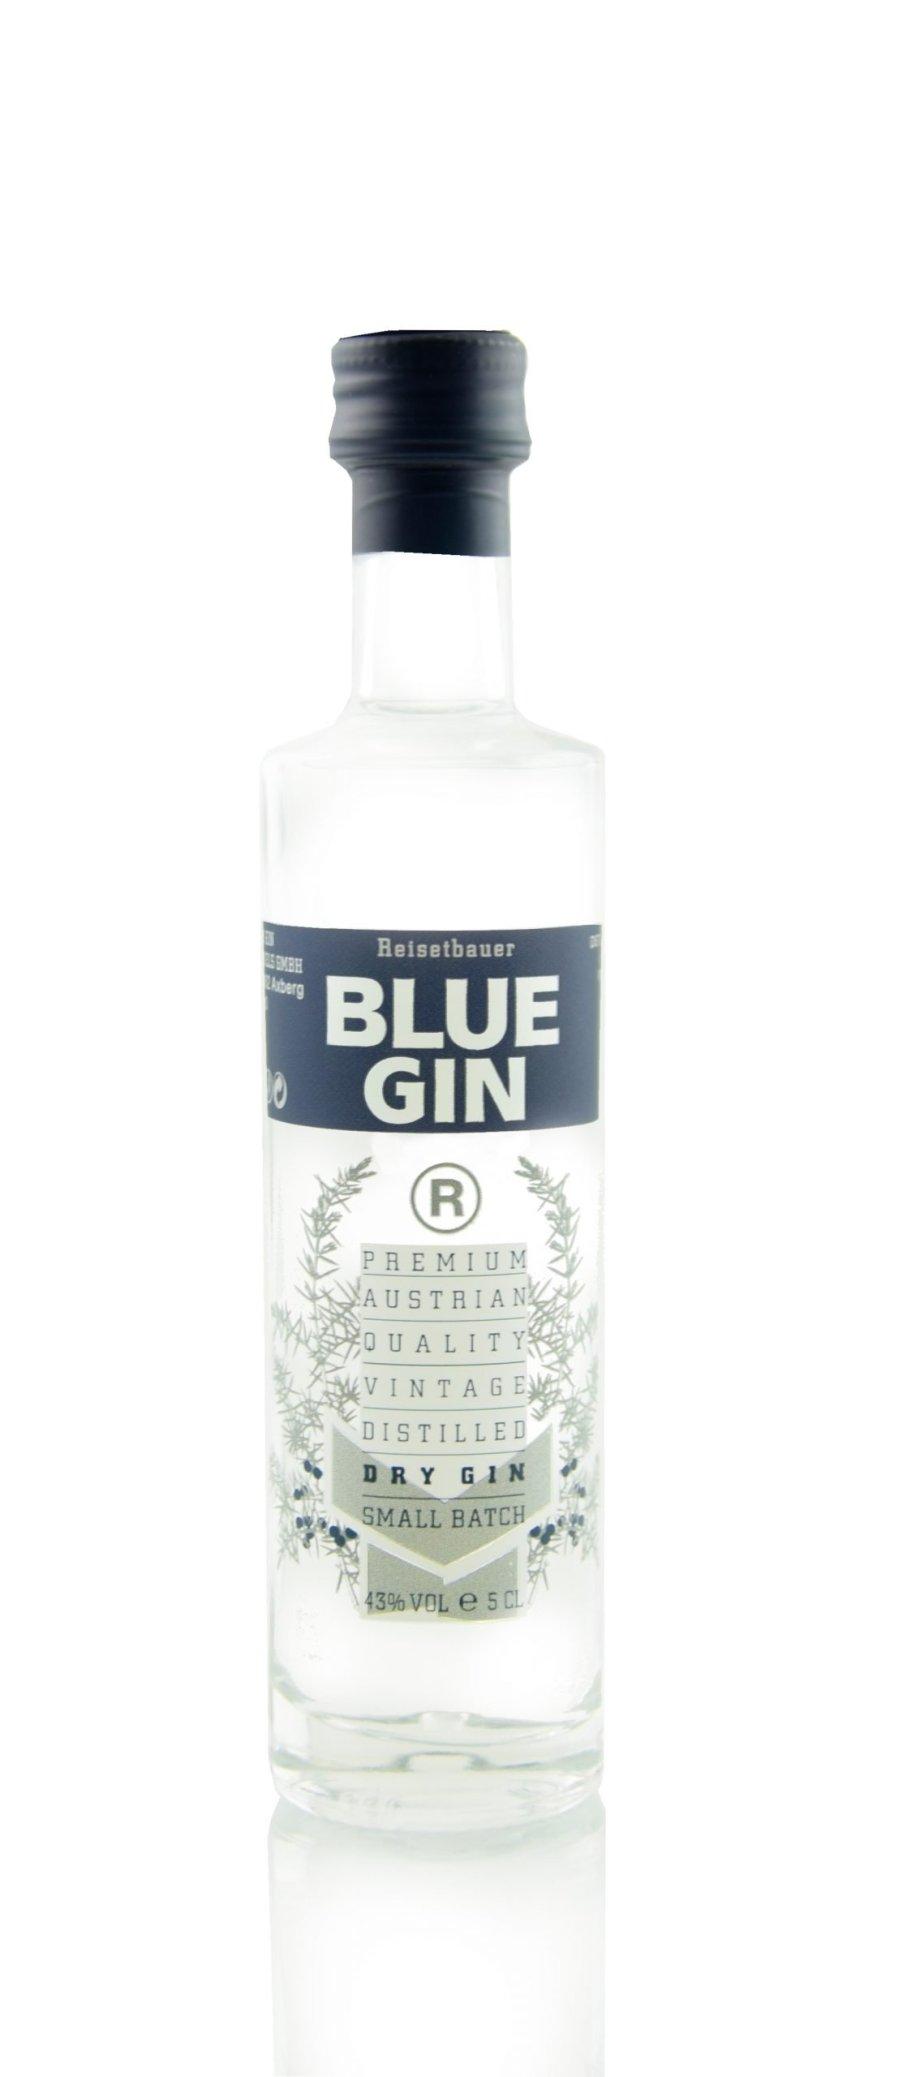 Macherei Blue Gin